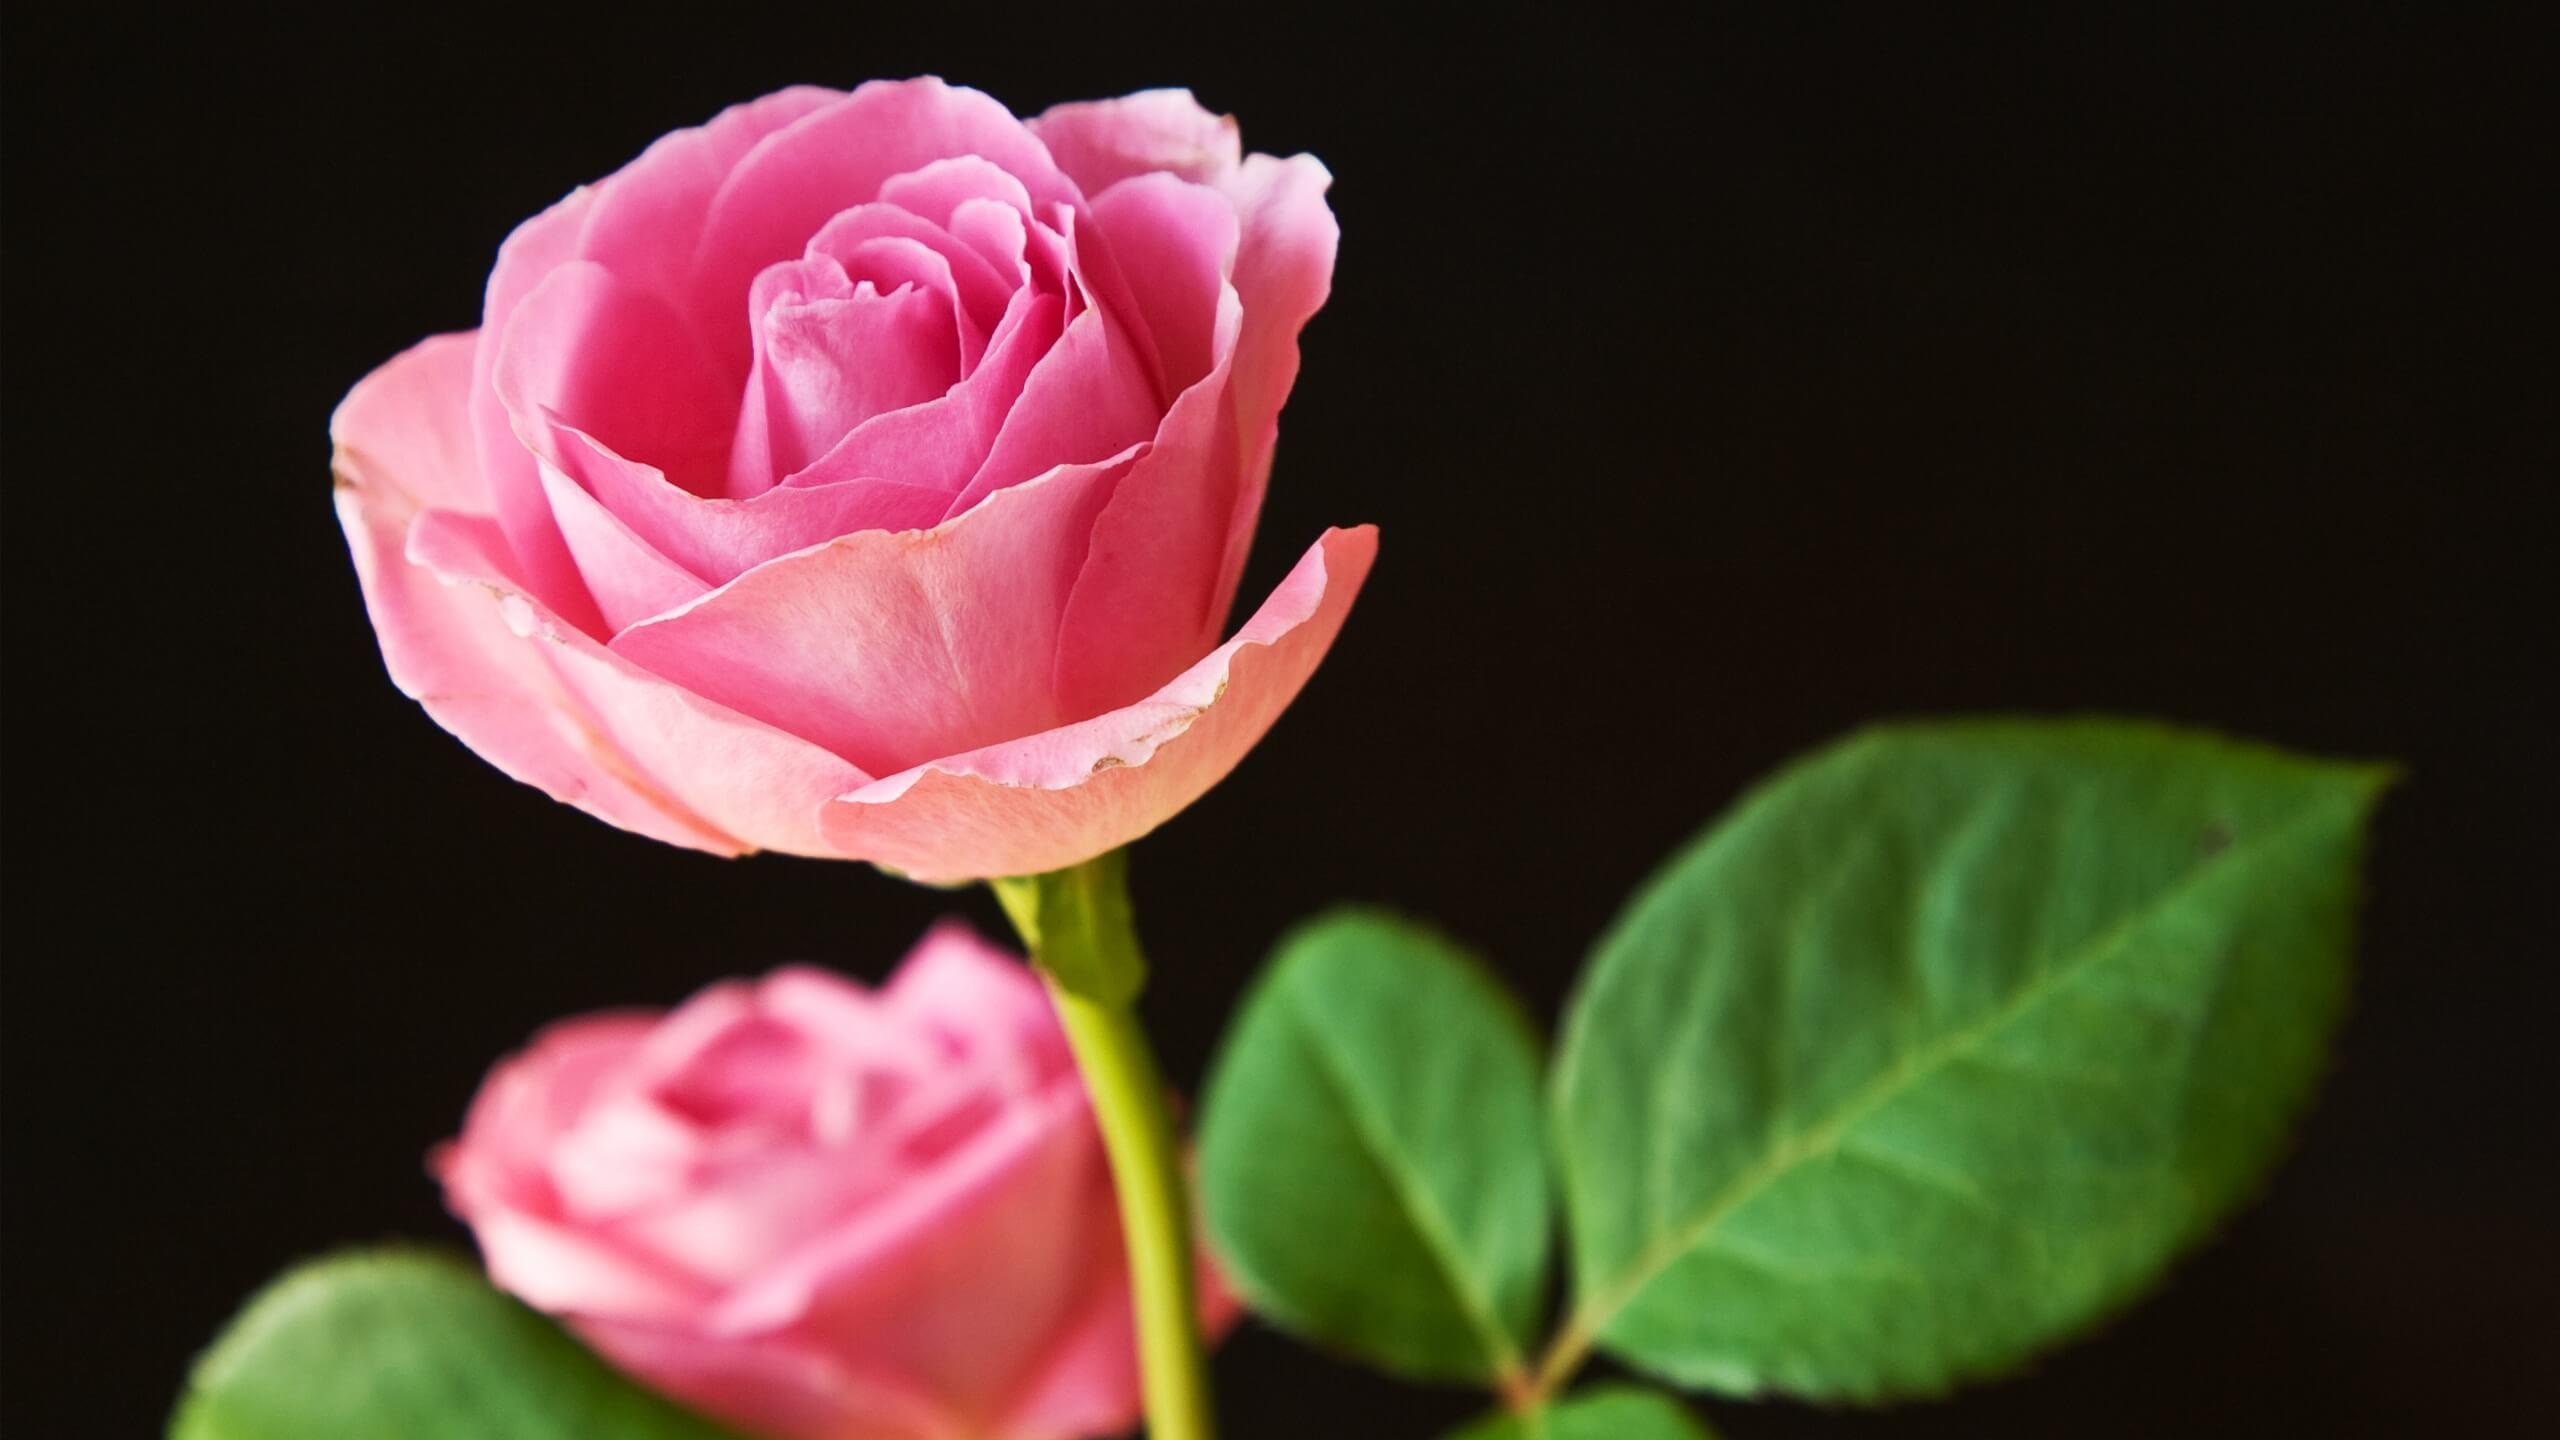 Res: 2560x1440, Pink rose flower. Download wallpaper